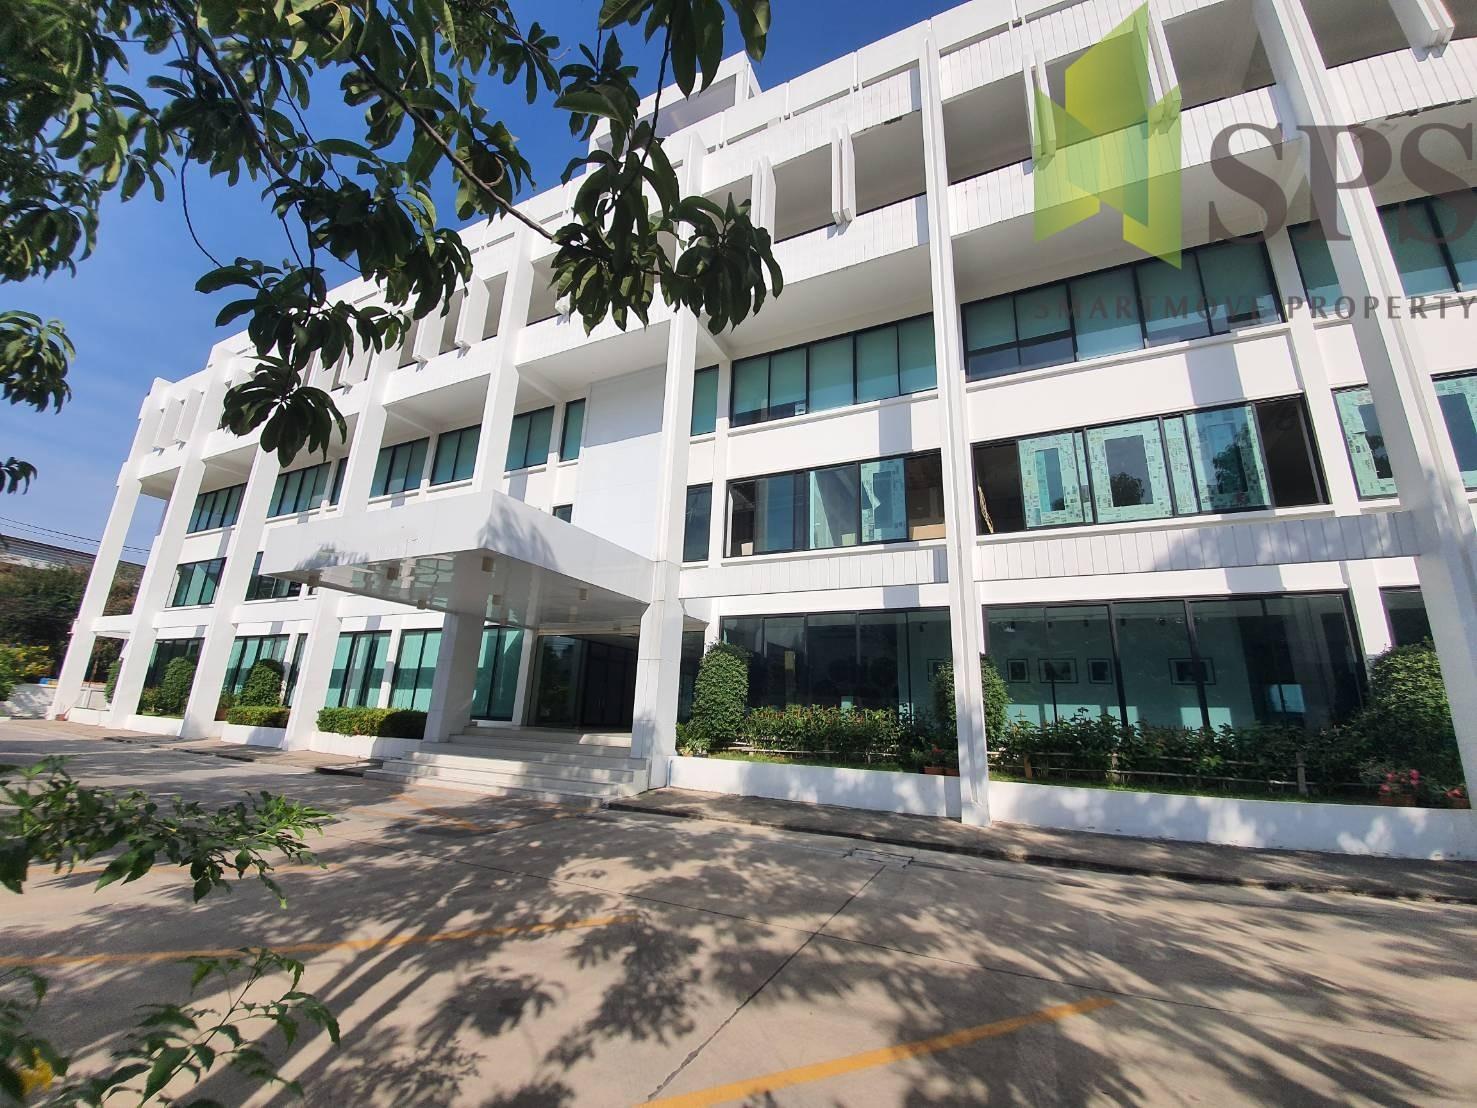 Office space Near BTS Phakanong พื้นที่สำนักงานให้เช่าใกล้บีทีเอสพระโขนง( SPSPE352)